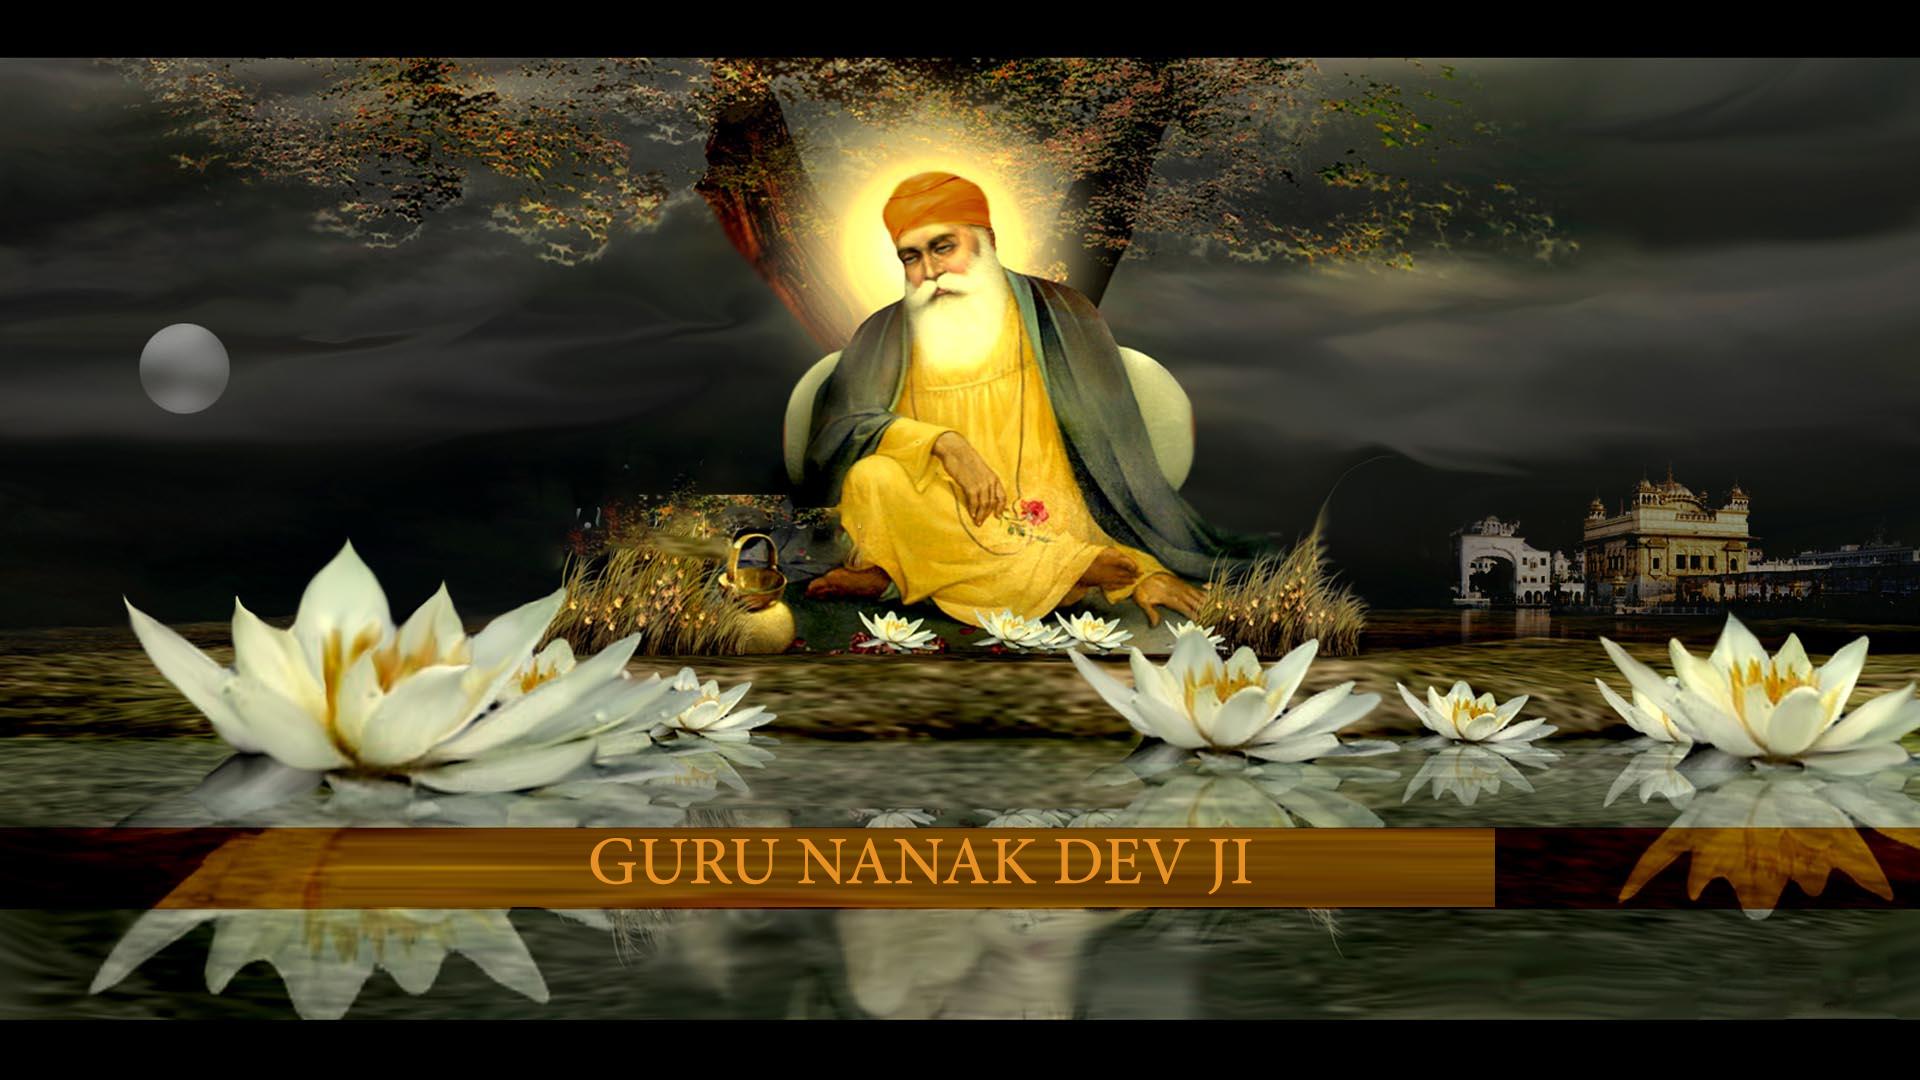 Guru Nanak Dev Hd Images High Resolution